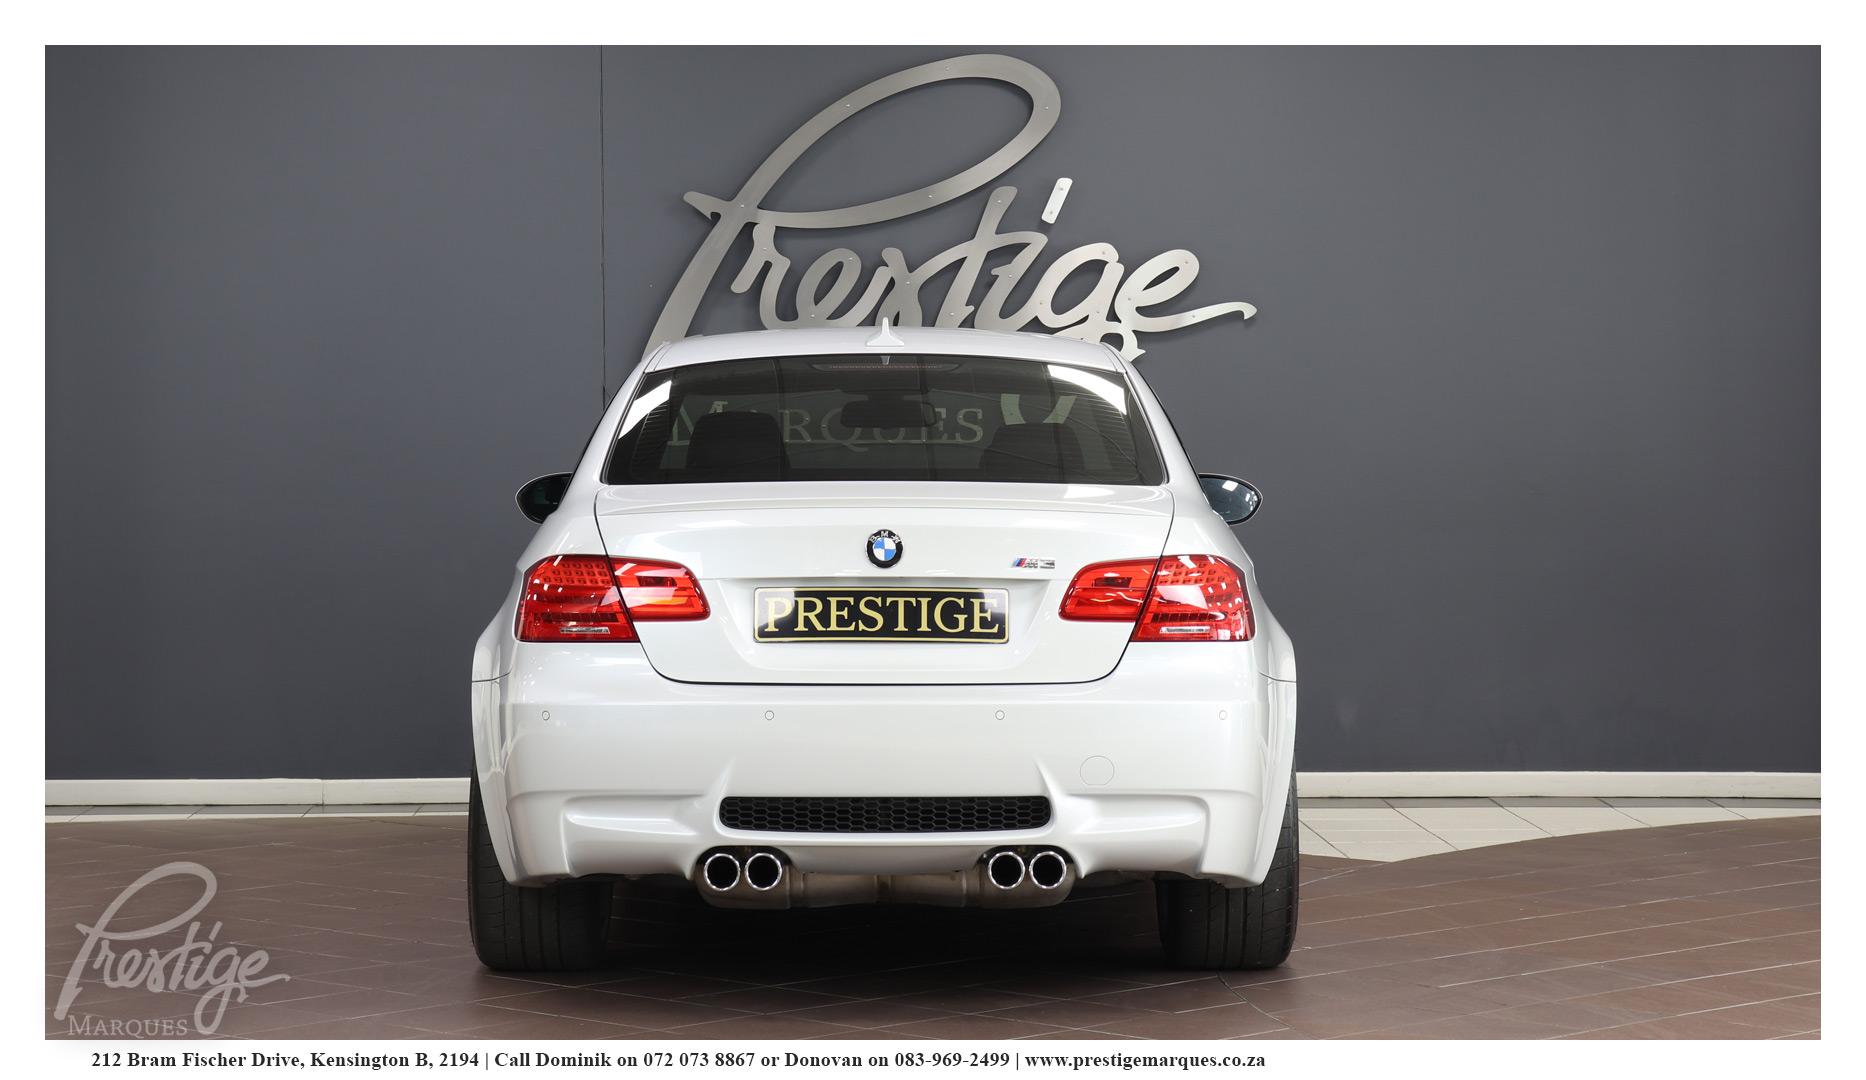 2013-BMW-M3-Competition Package-MDCT-Prestige-Marques-Randburg-Sandton-4